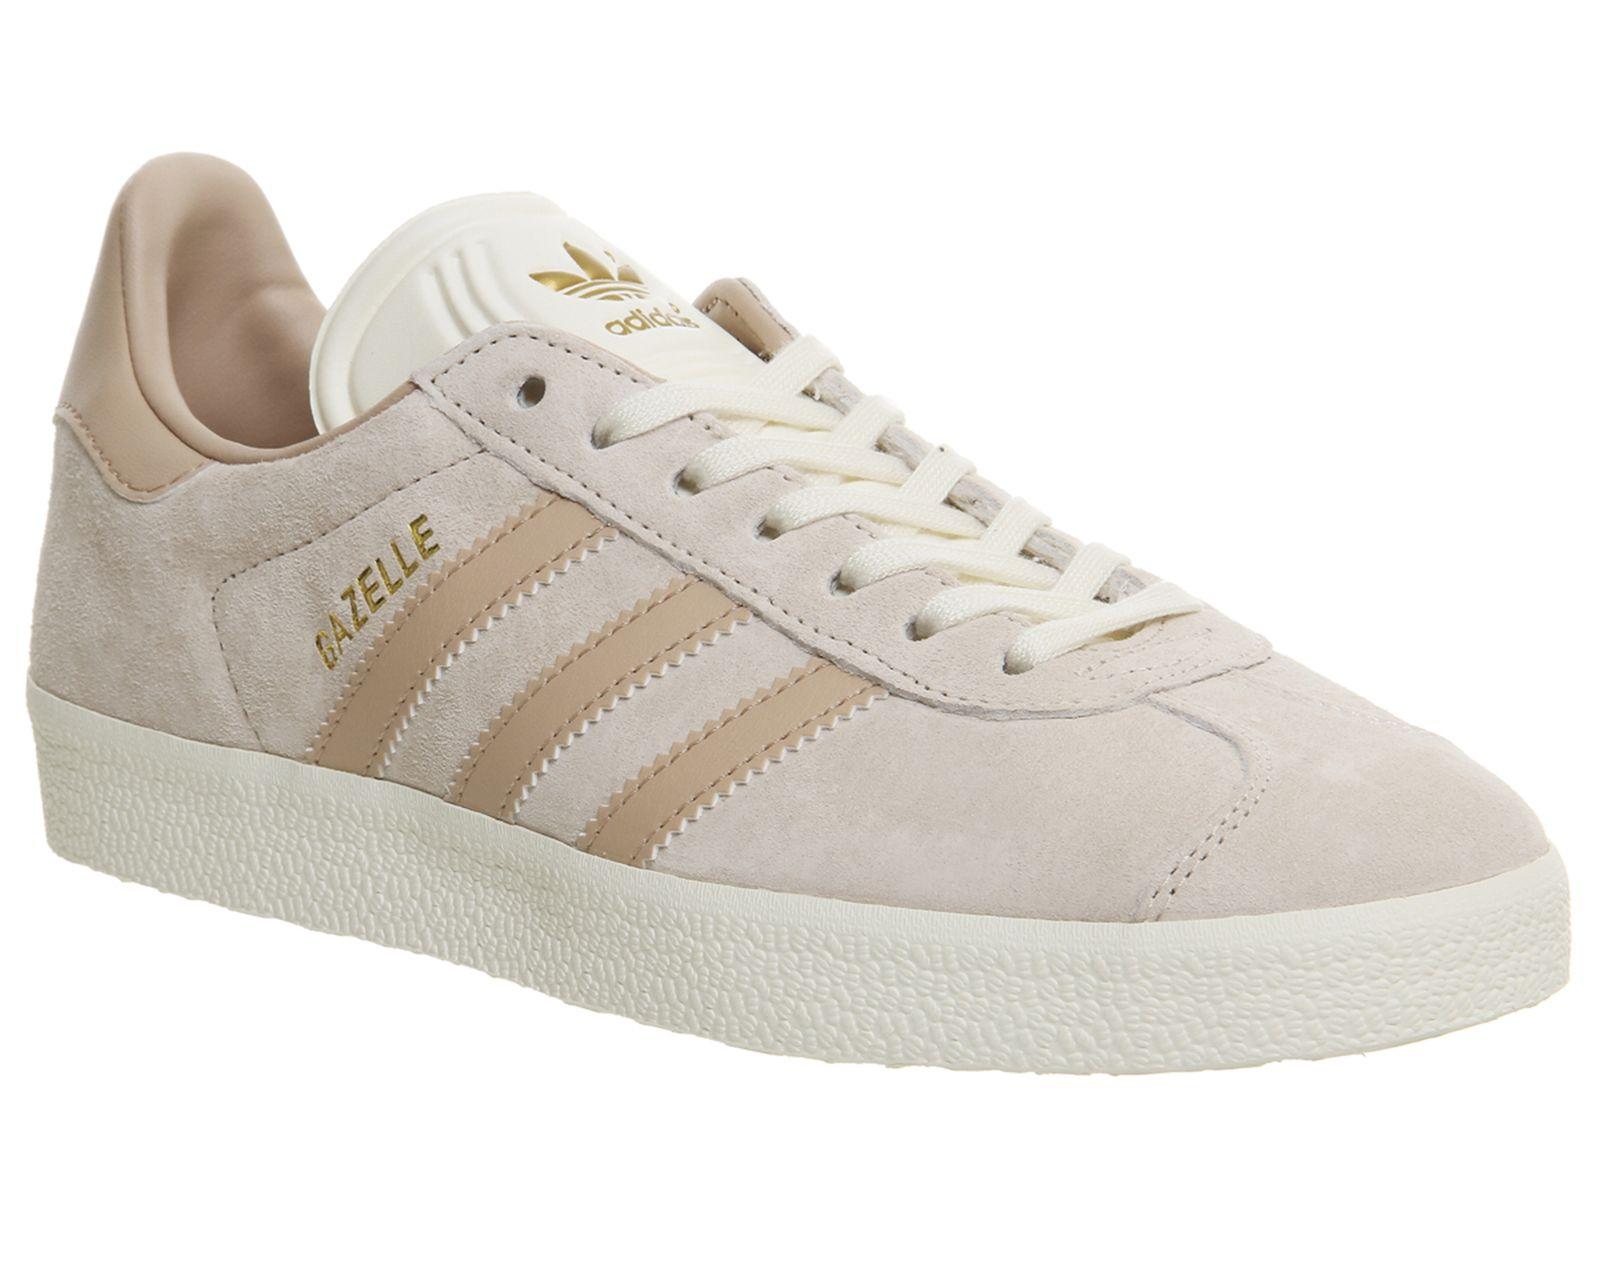 Adidas Gazelle Trainers Vapour Pink linen Cream White Exclusive